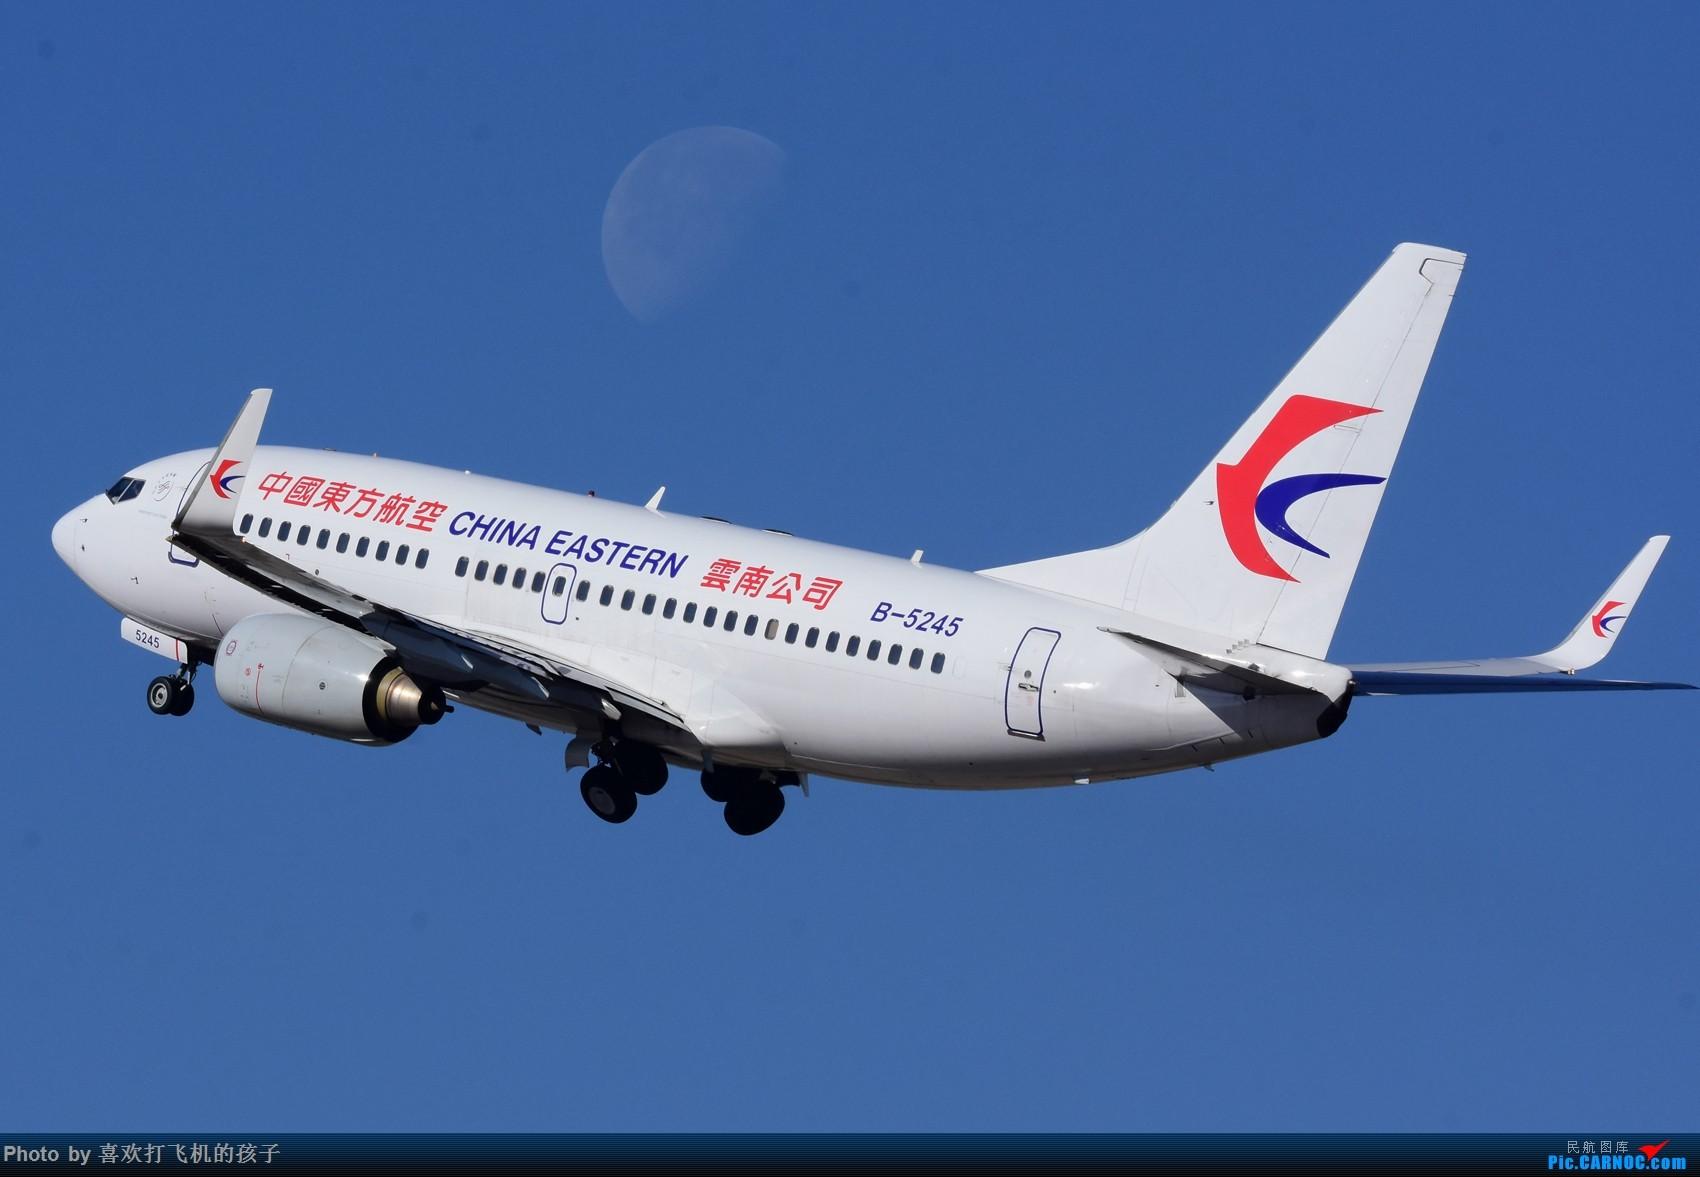 Re:[原创]【机机的飞飞】 KMG昆明长水,年初存货 BOEING 737-700 B-5245 中国昆明长水国际机场